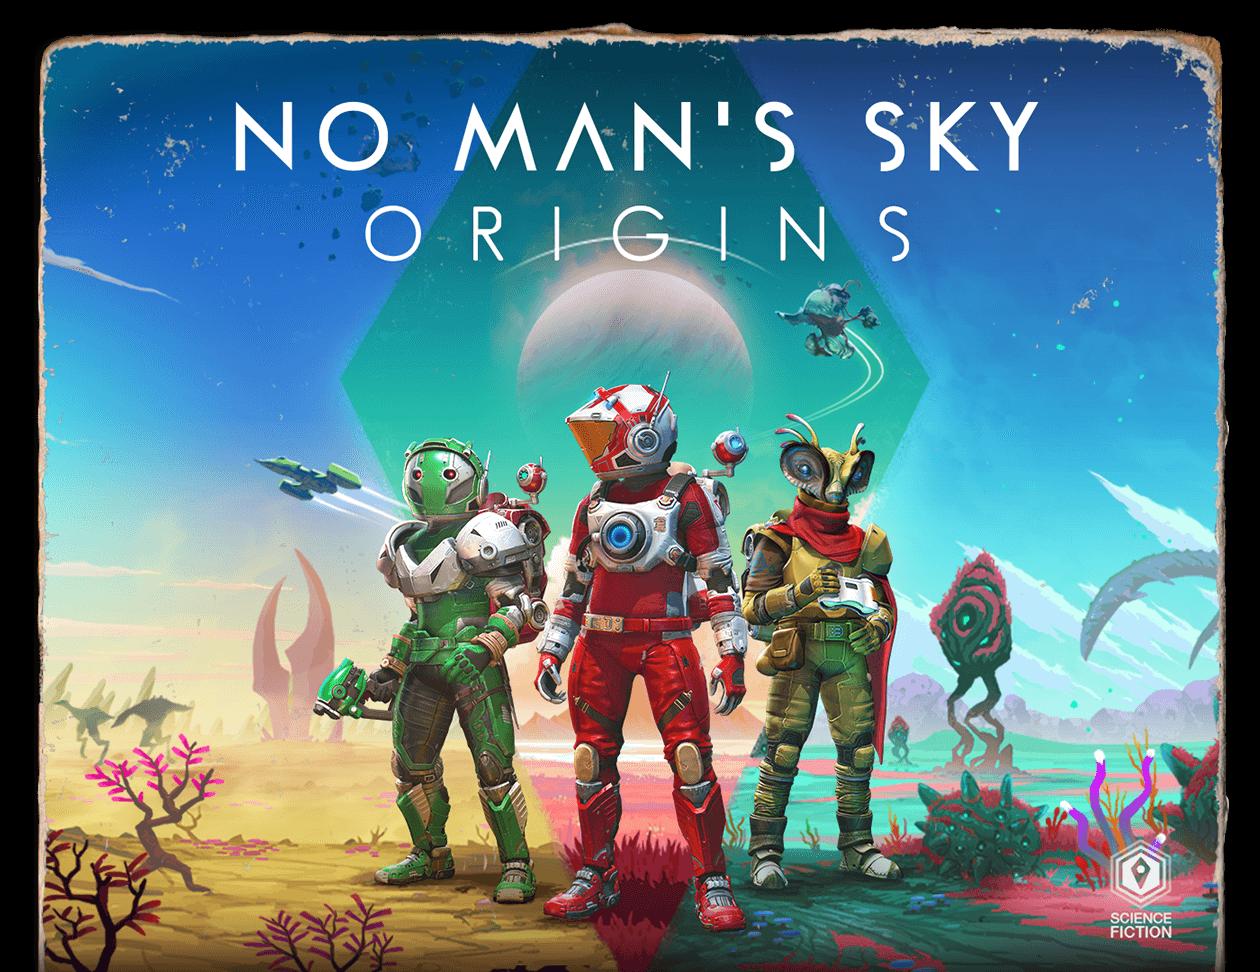 Book cover styled art showcasing No Man's Sky artwork